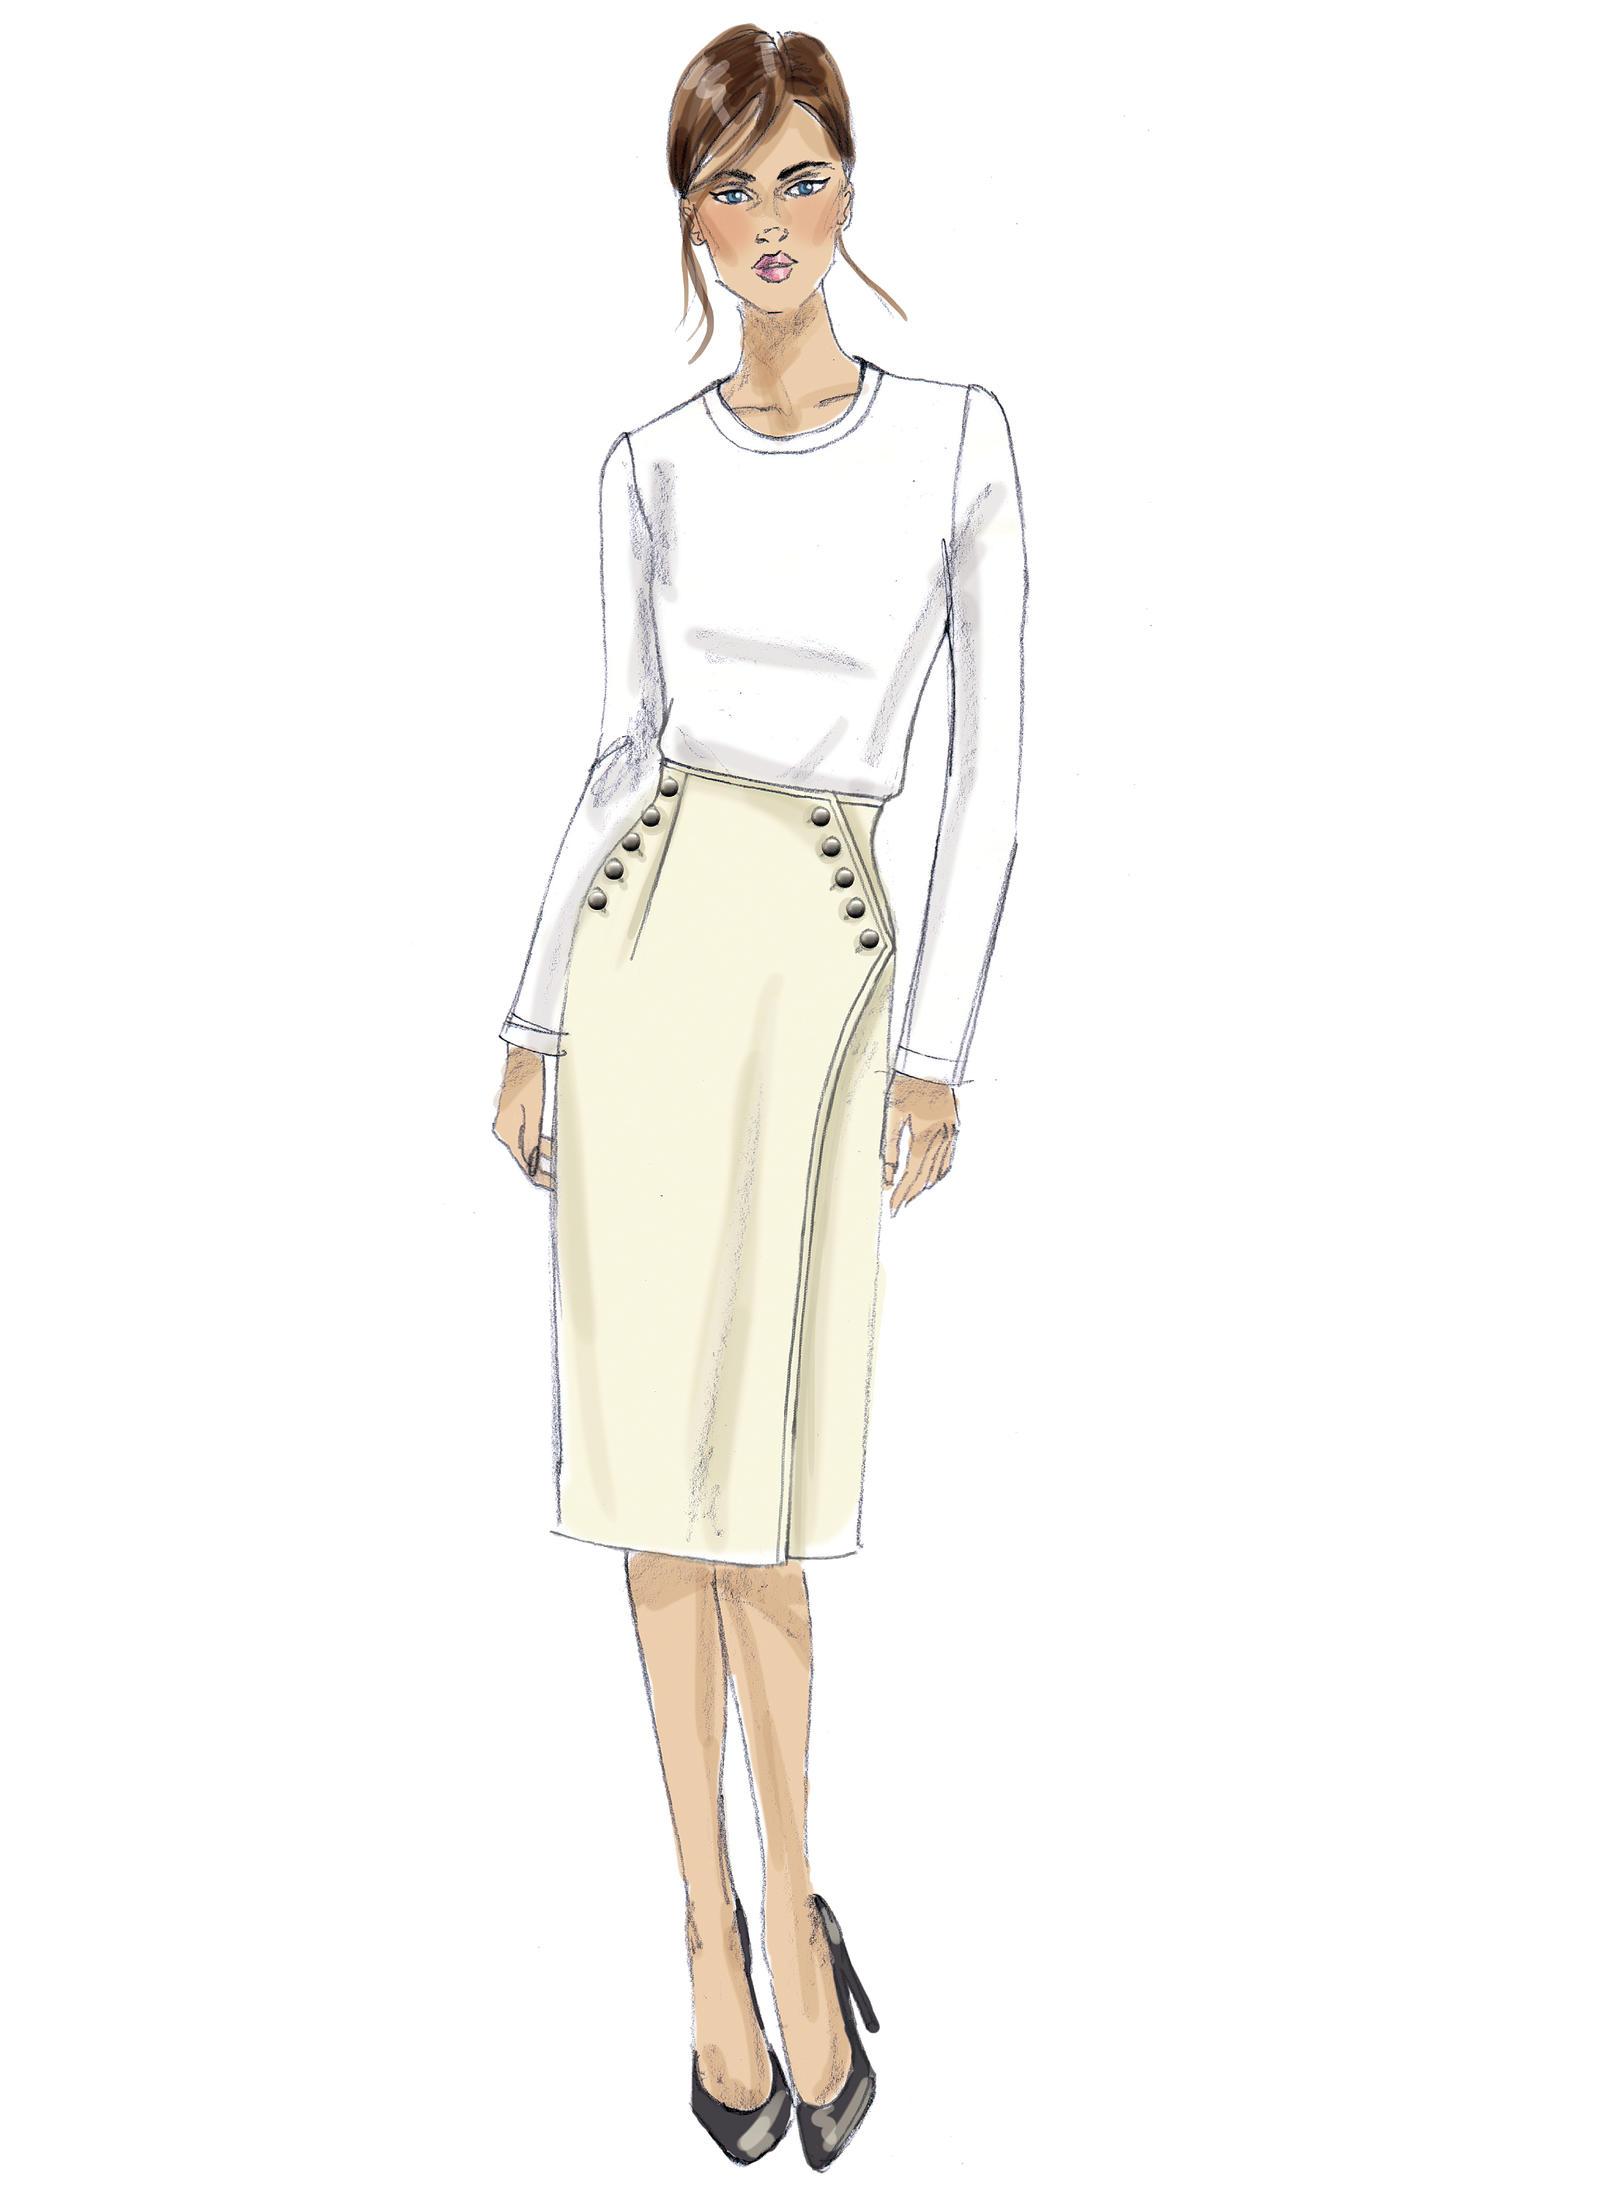 Vogue Patterns 9209- MISSES' BUTTONED WRAP SKIRT